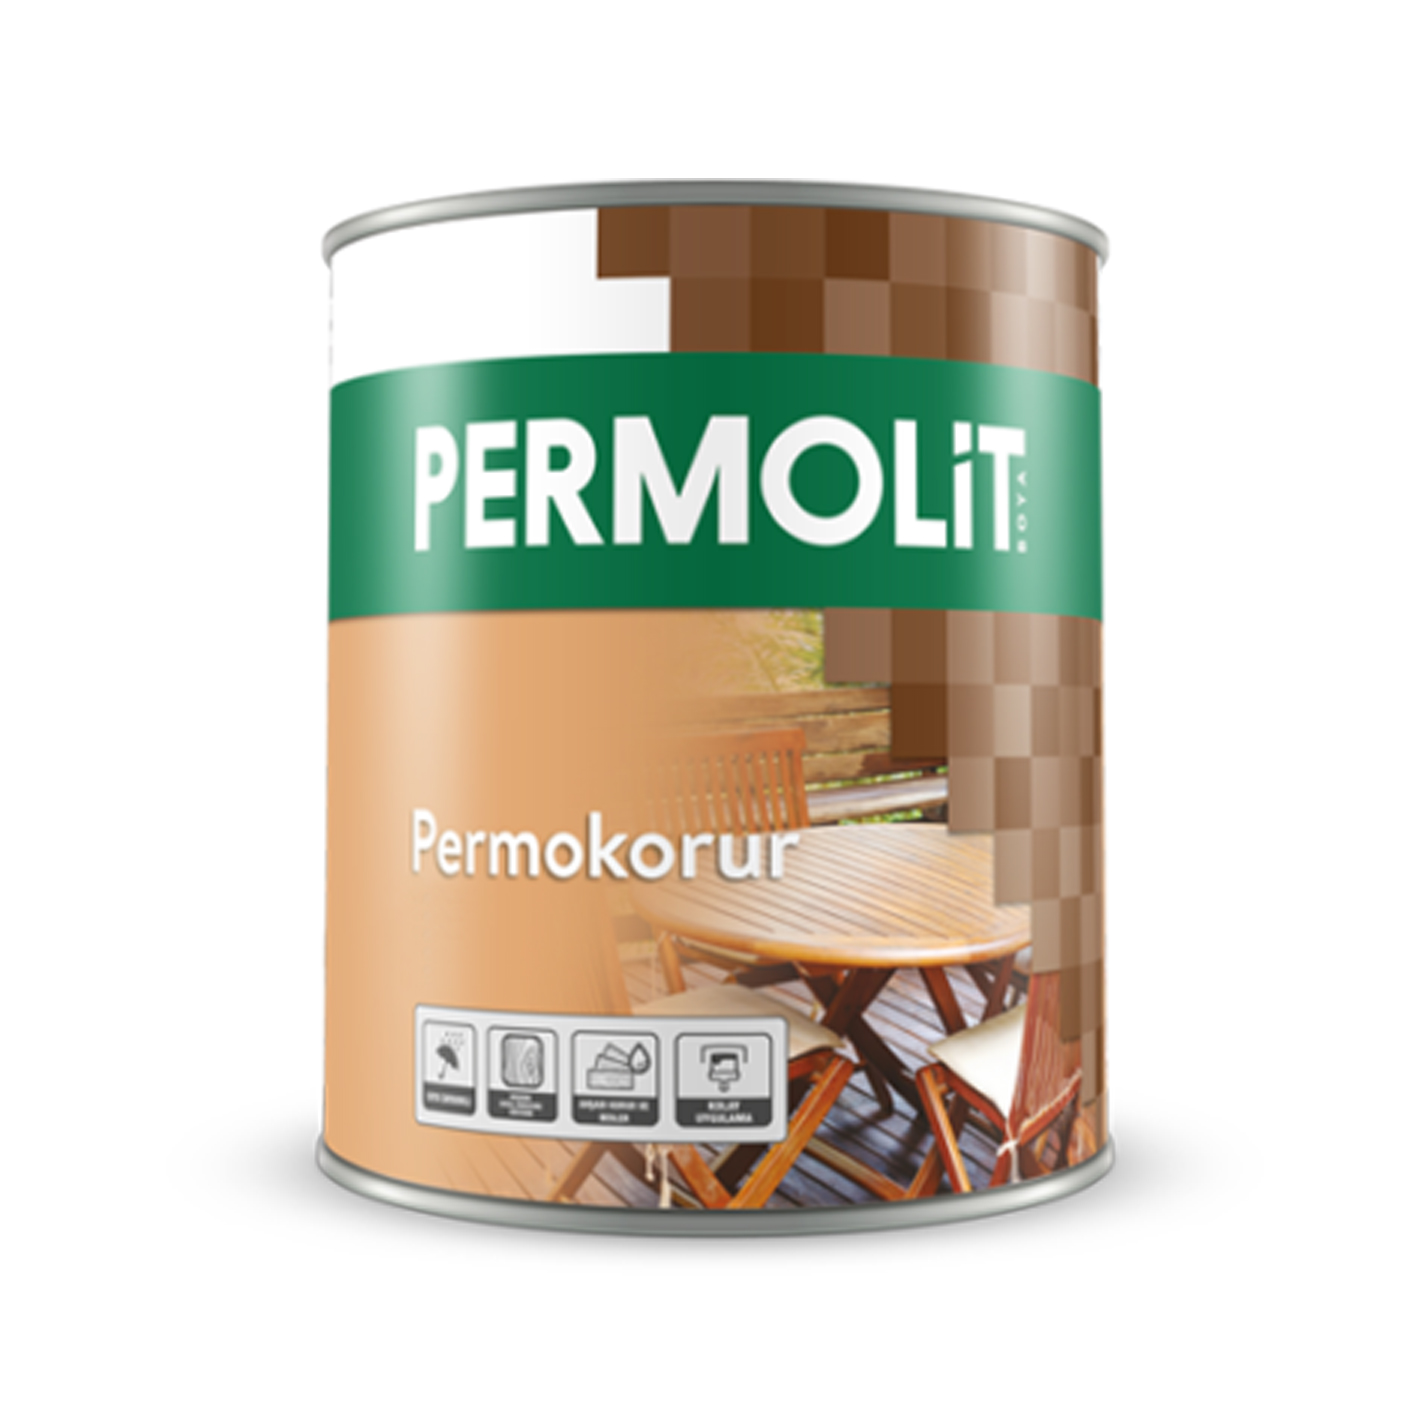 Permolit Permokorur Tik Yağı 0.75Lt